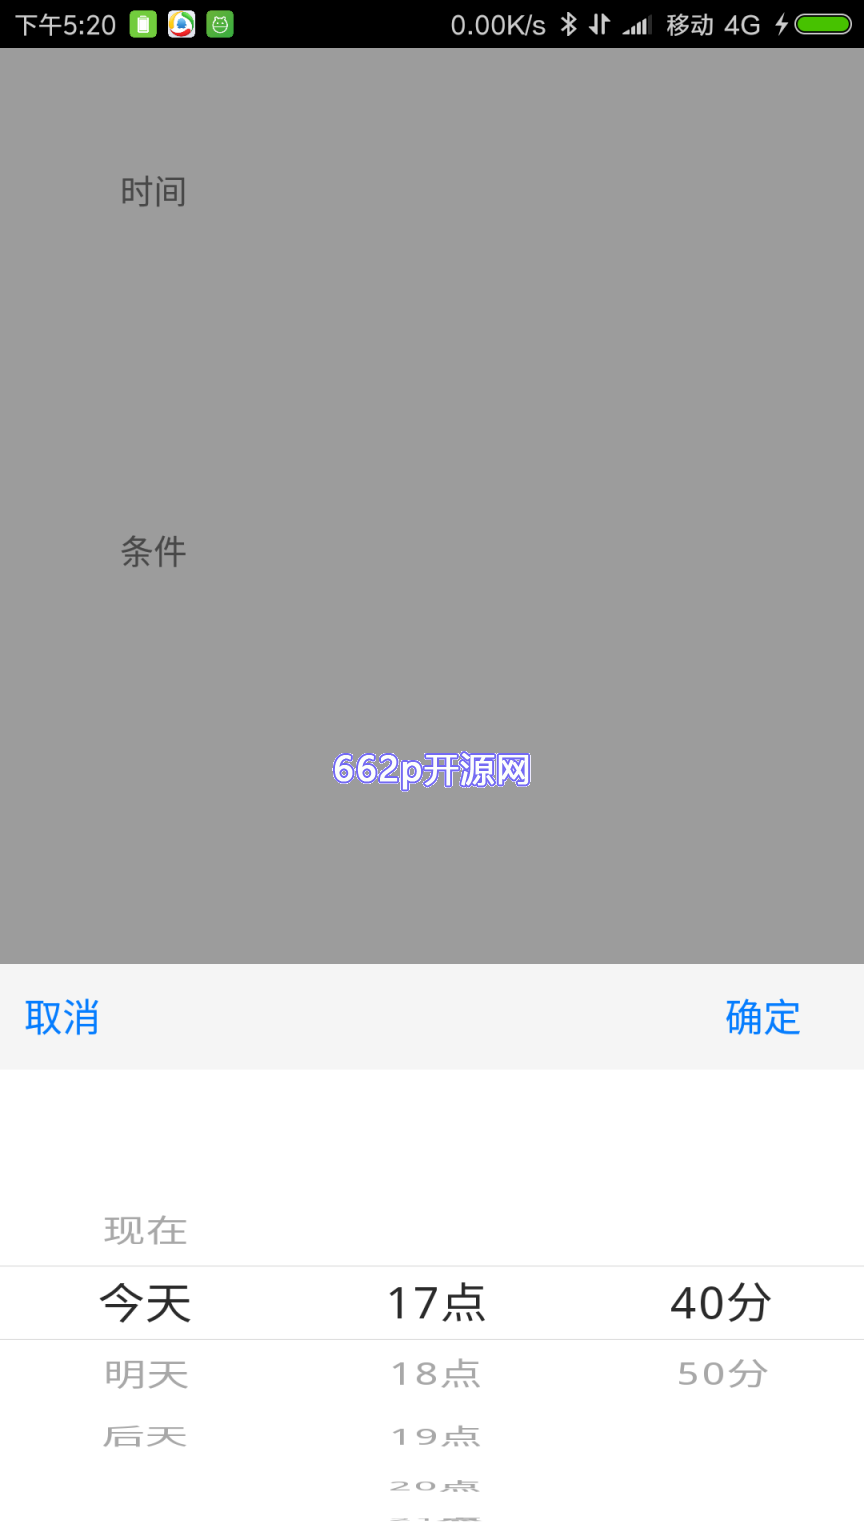 android仿滴滴时间选择控件源码